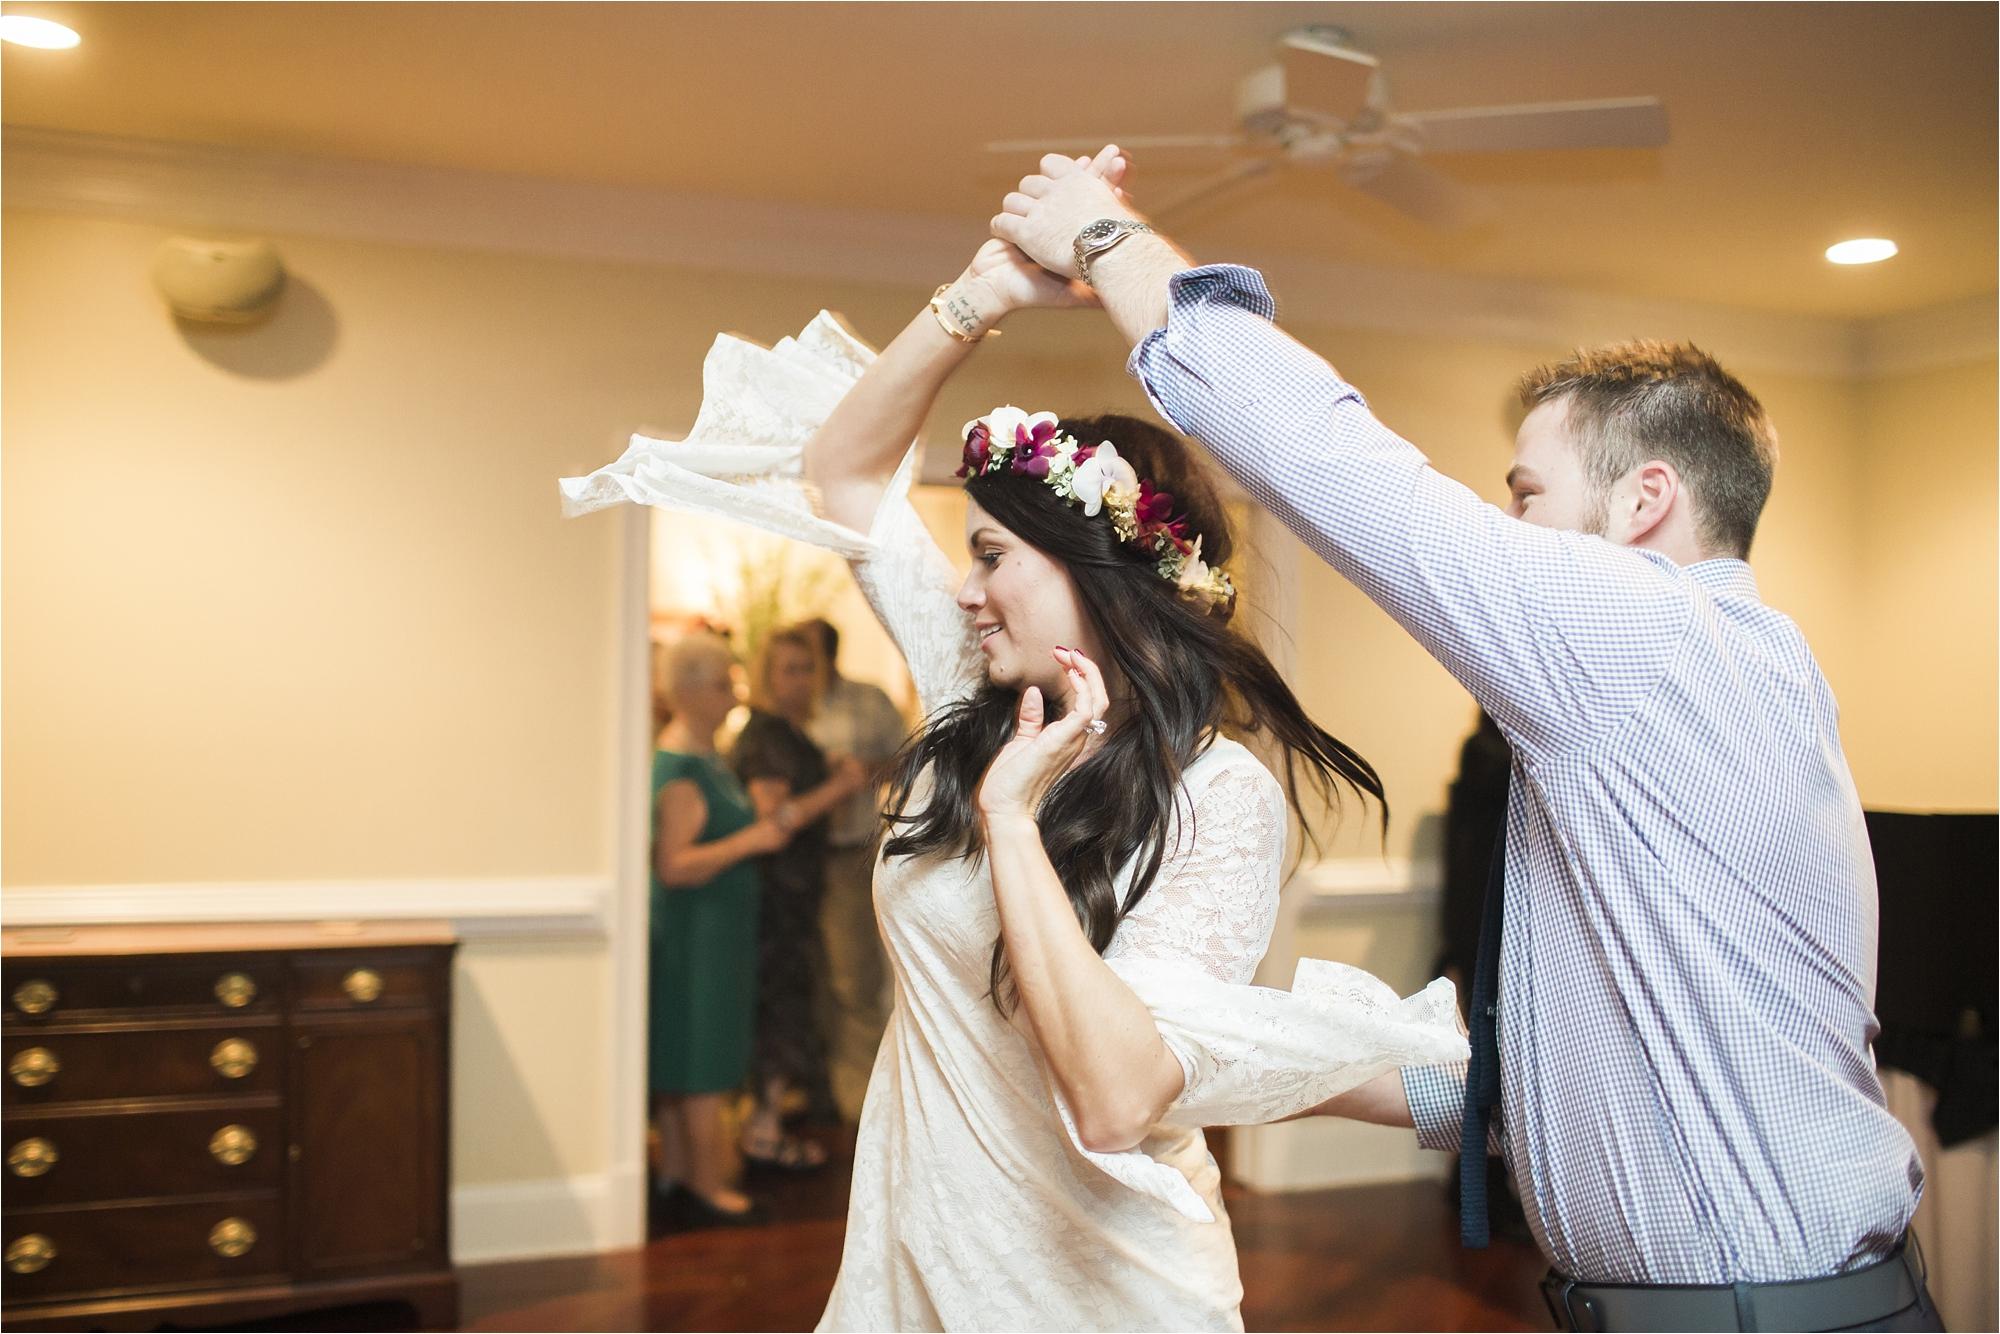 stephanie-yonce-photography-richmond-virginia-bohemian-outdoor-wedding-photo_0048.jpg